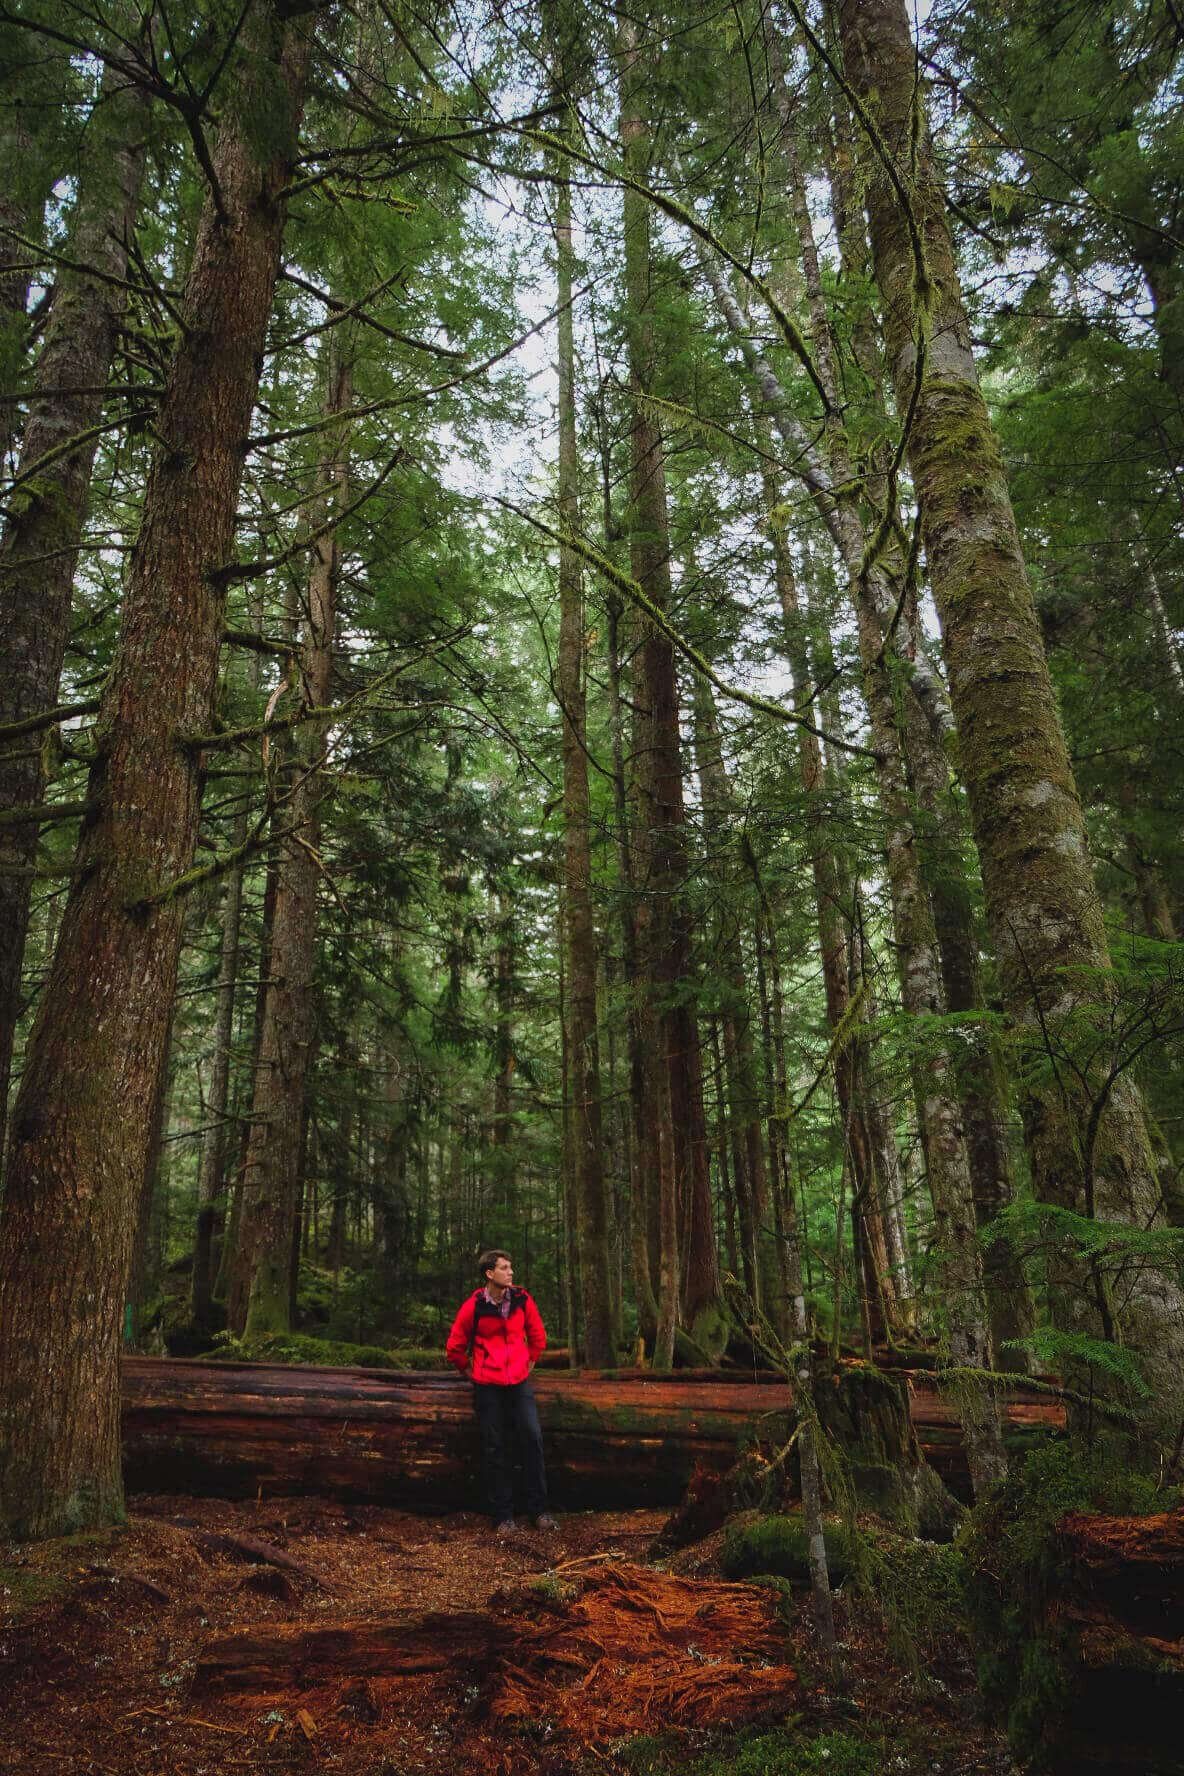 British Columbia conifer forest